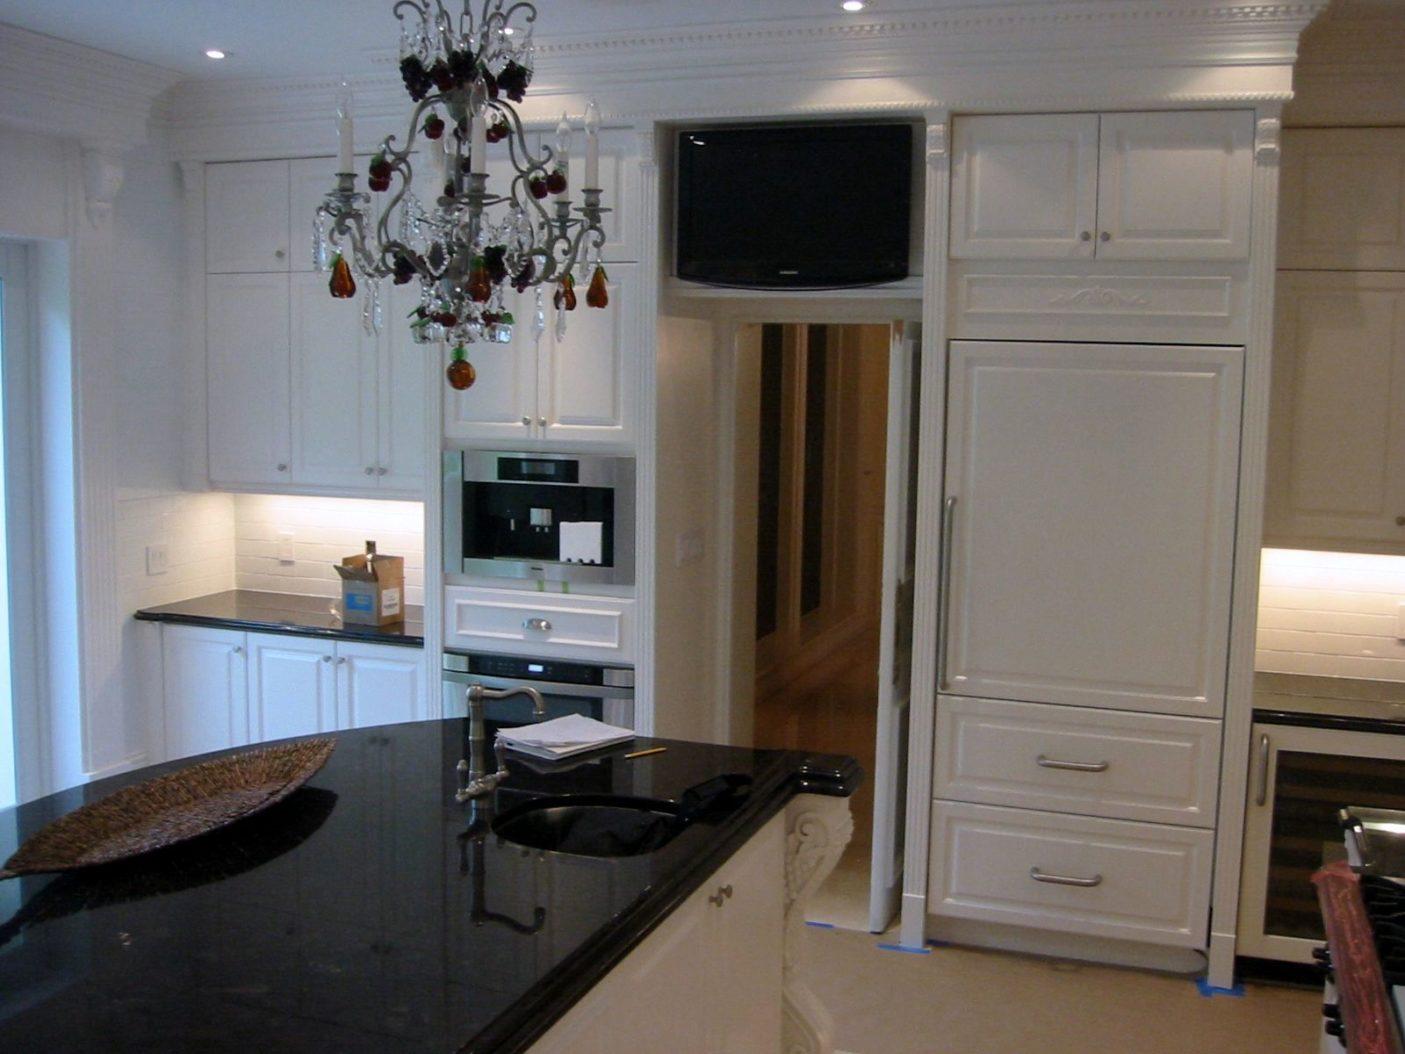 Kitchens-197.jpg